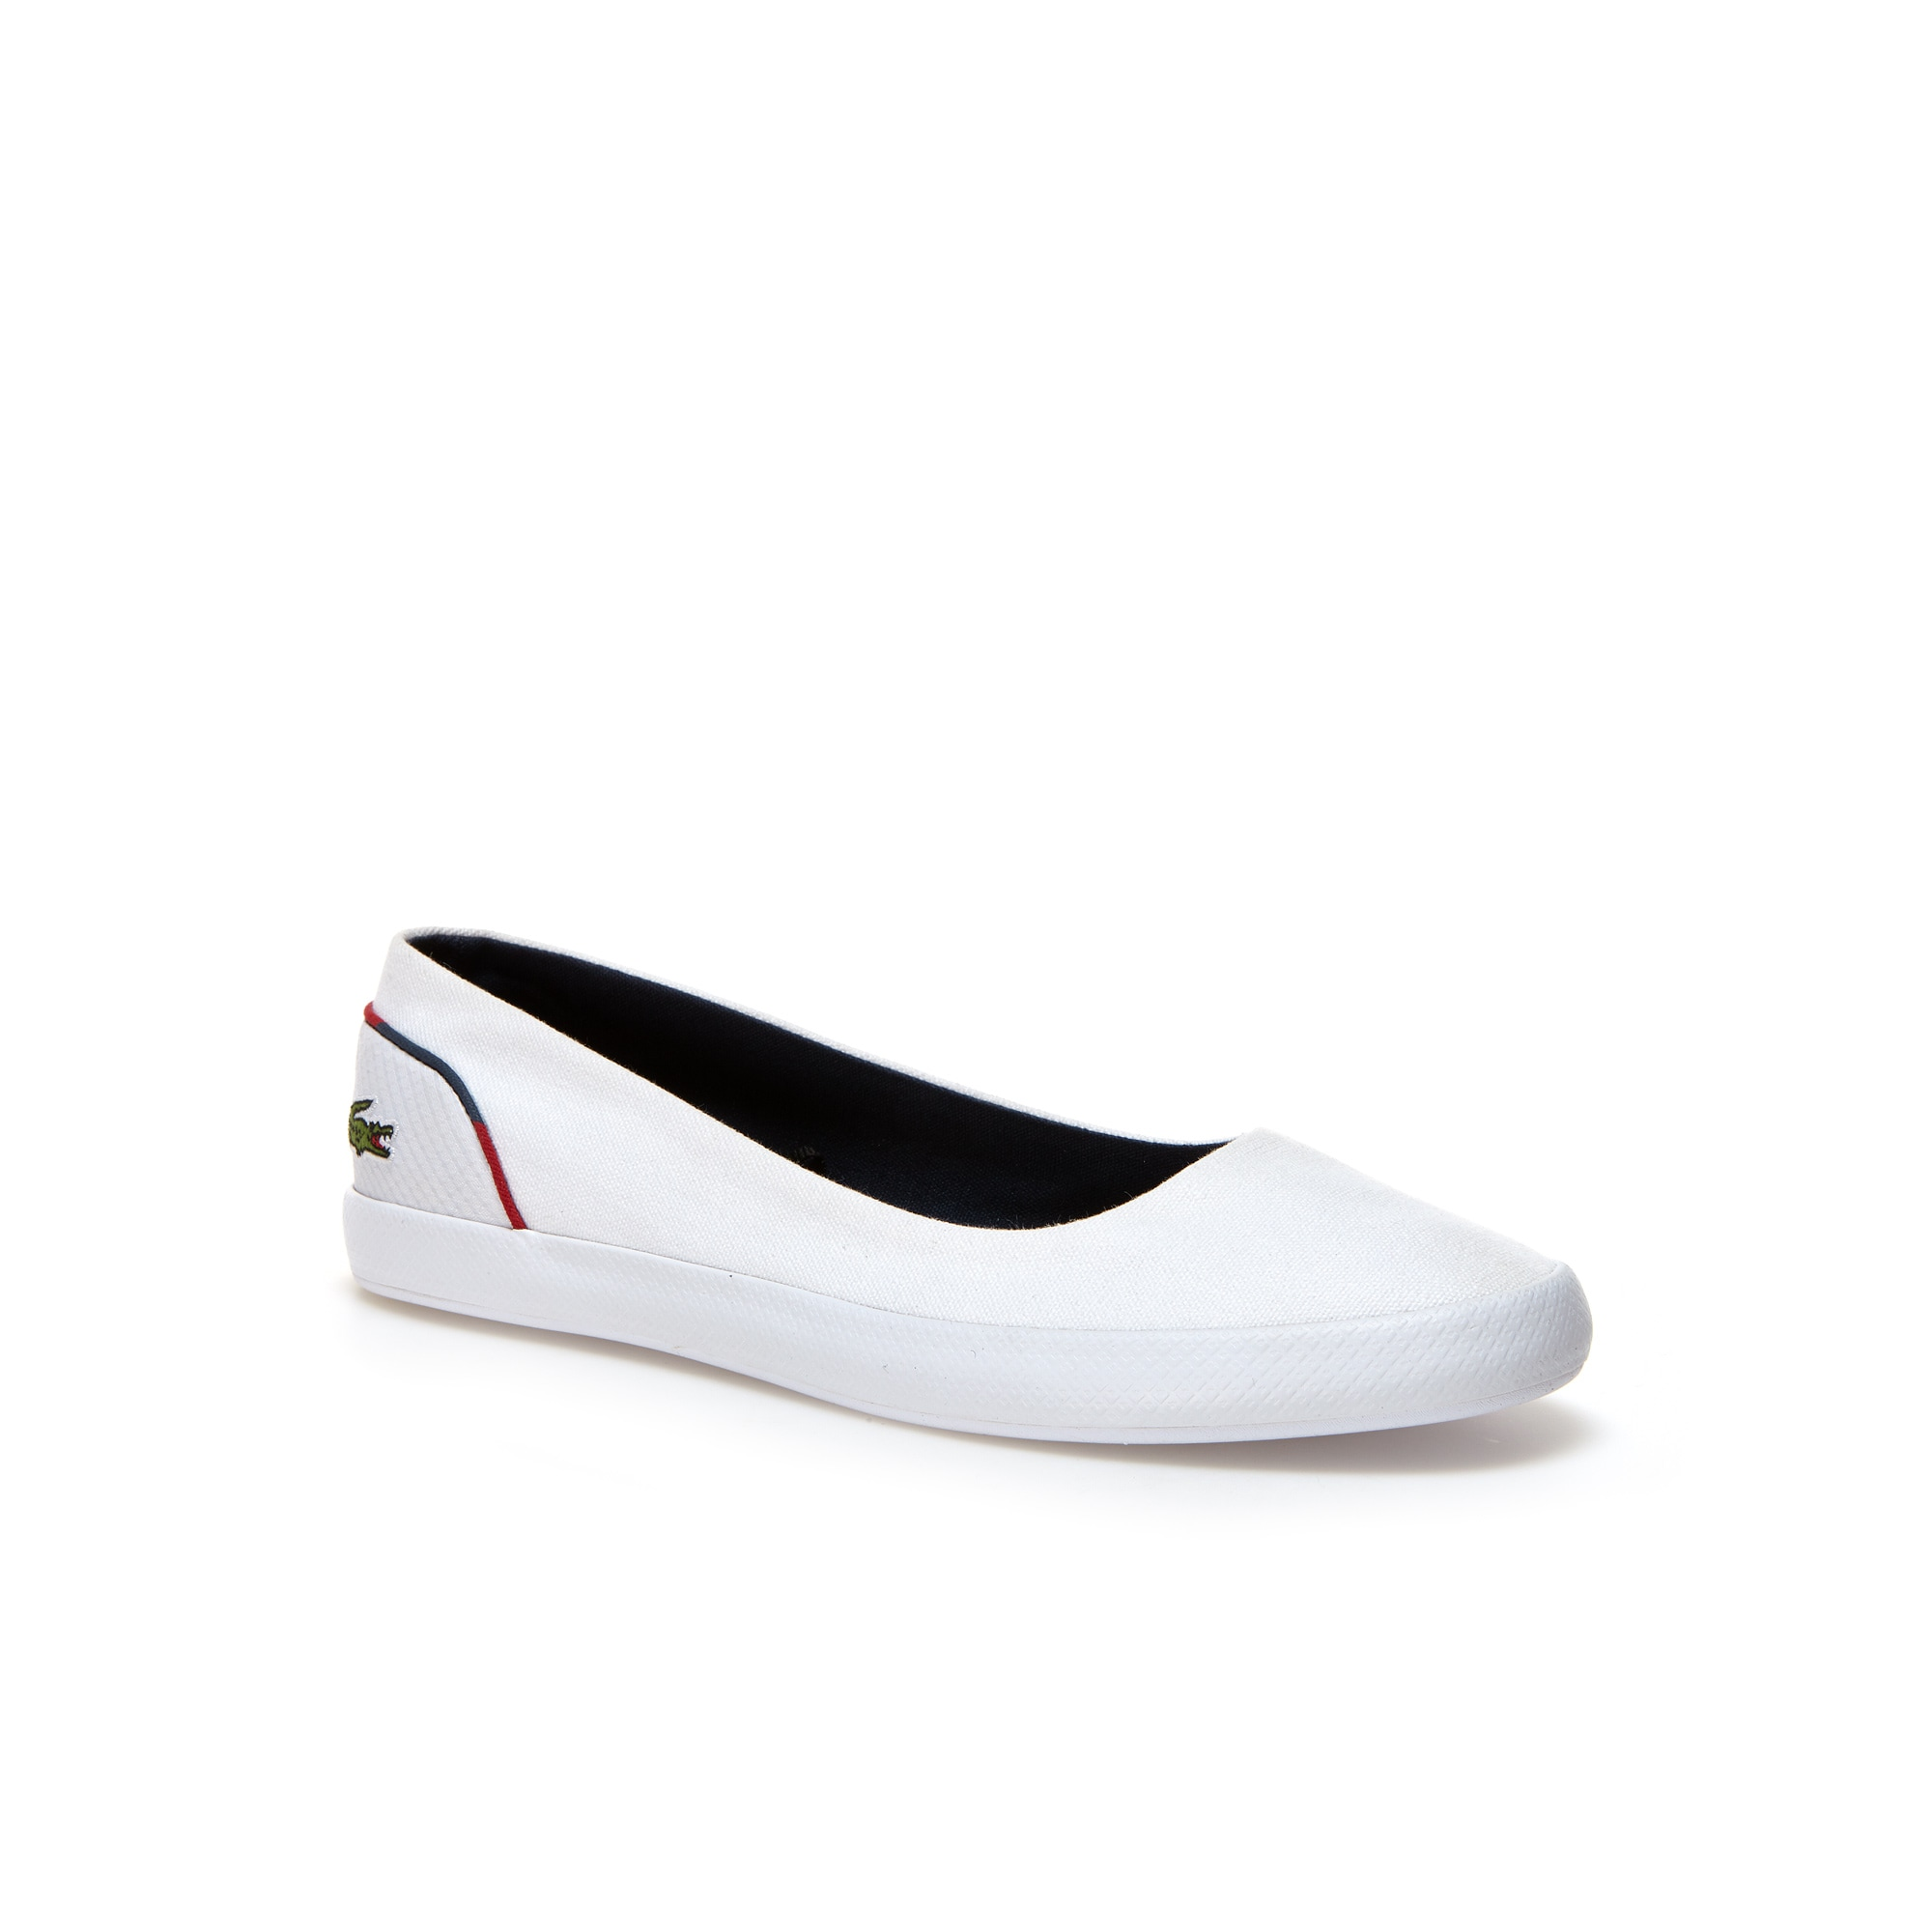 Sneakers senza stringhe Lancelle Ballerina in tela